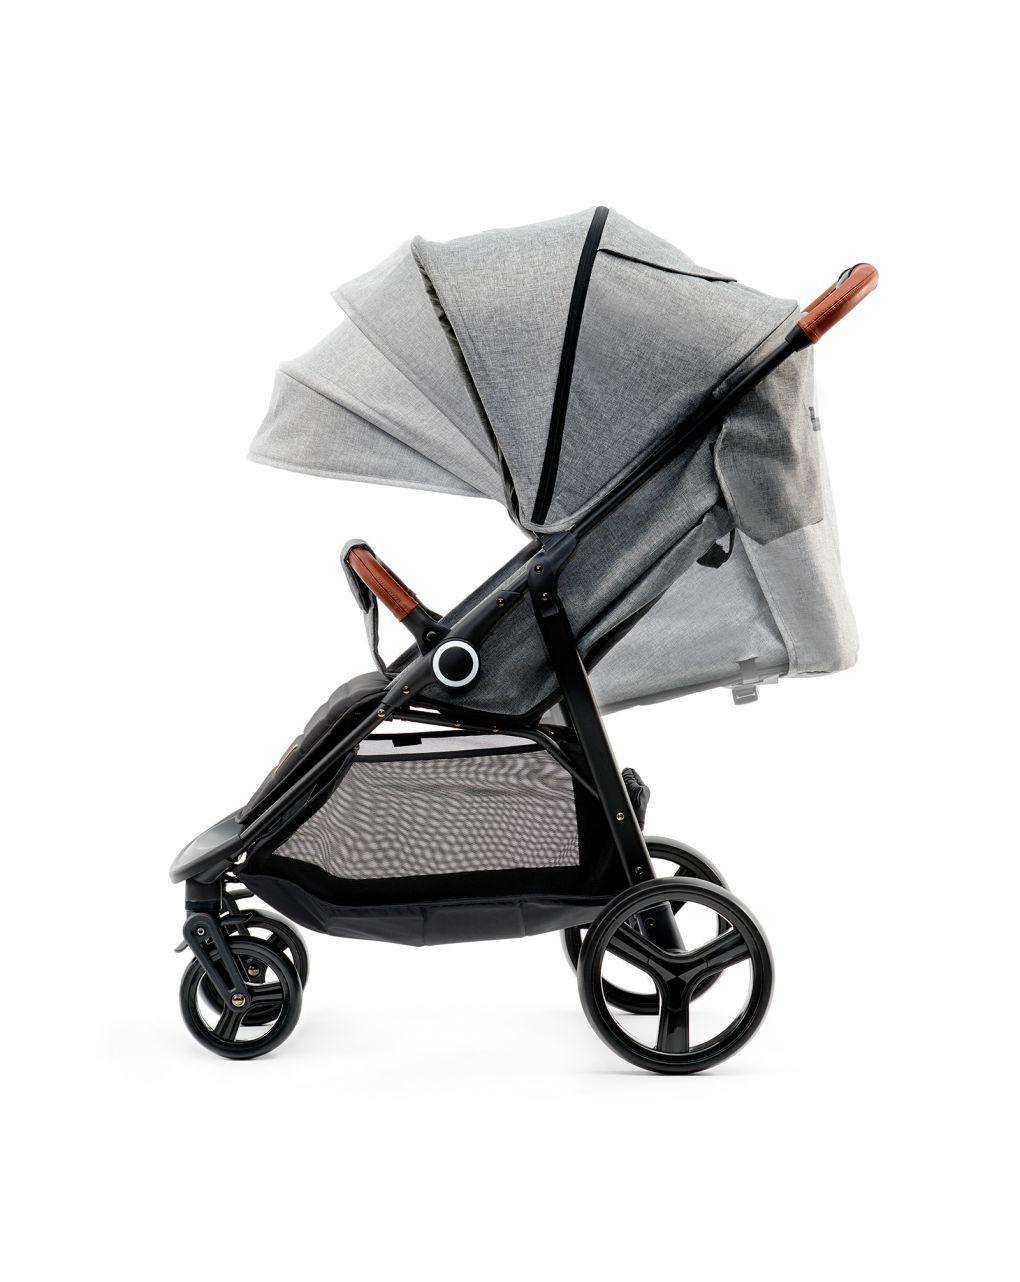 Kinderkraft passeggino grande gray - Kinderkraft